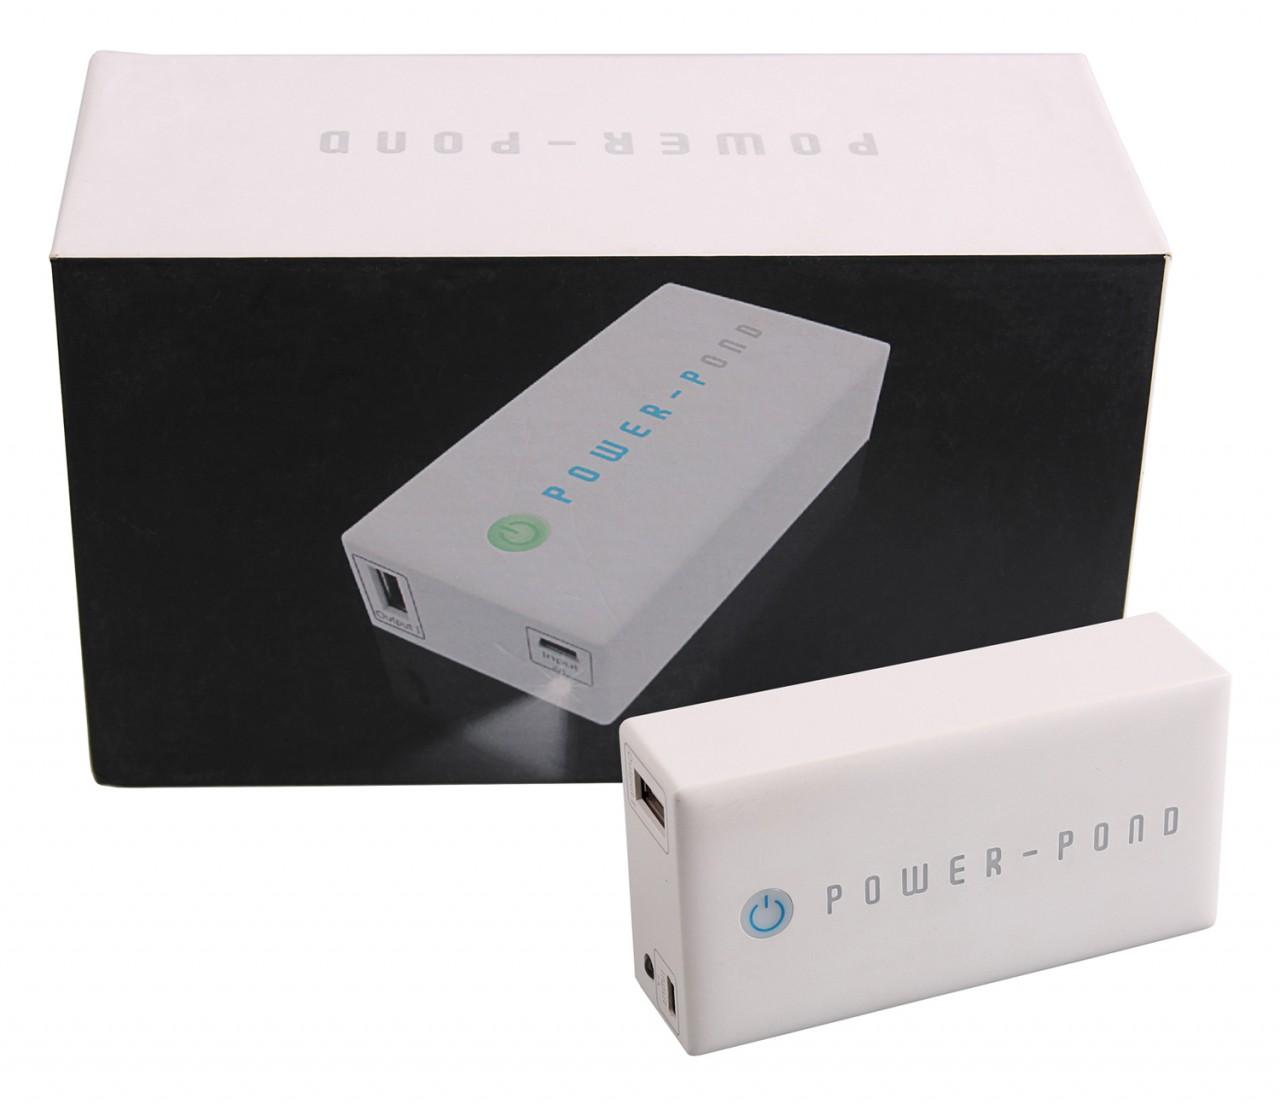 PATONA POWER-POND edle Powerbank f. IPHONE IPAD SMARTPHONE D